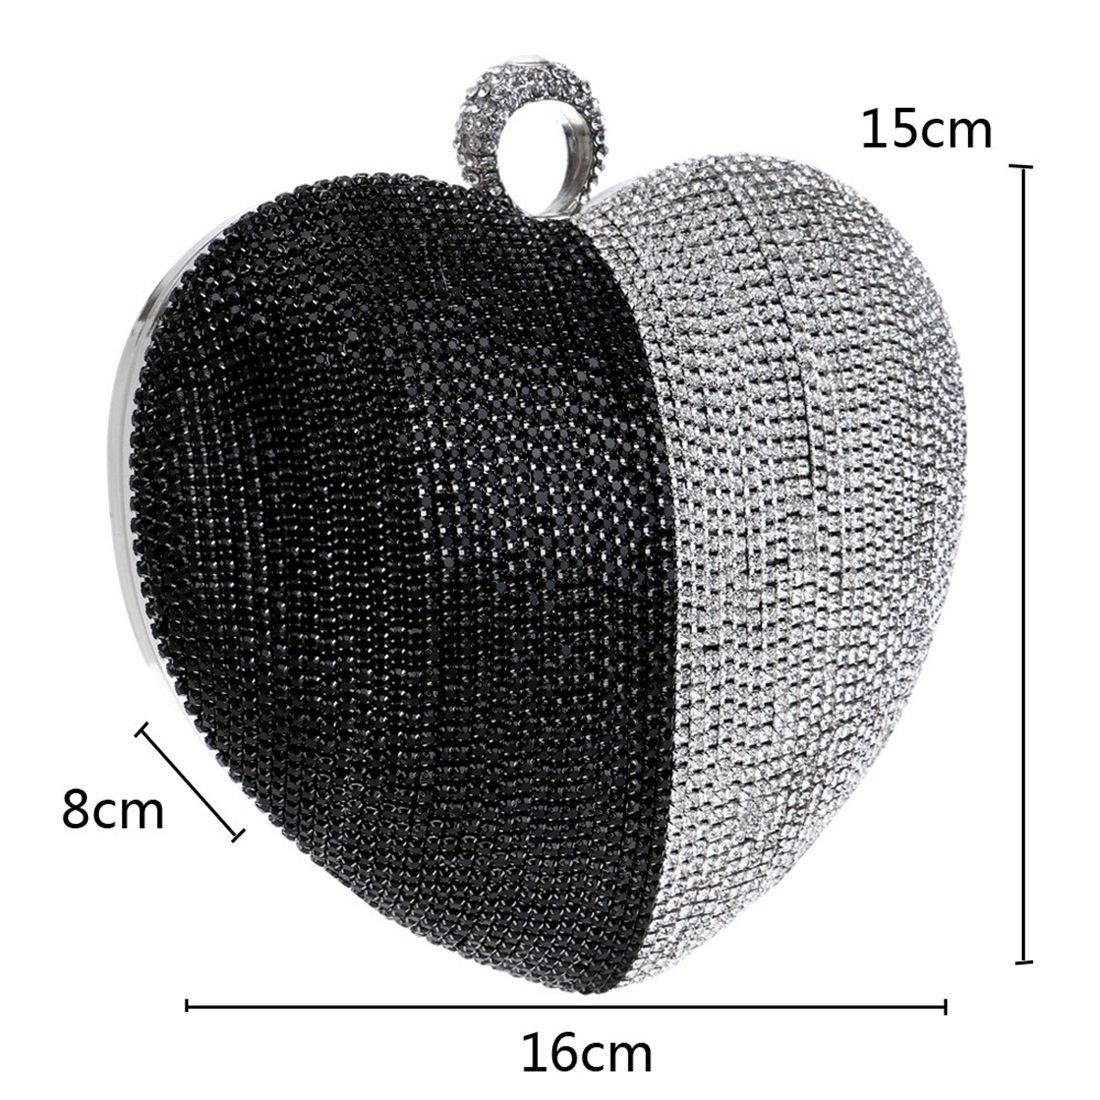 YUKILOCC Womens Clutch Purse Diamond Heart-shaped Evening Shoulder Messenger Bag